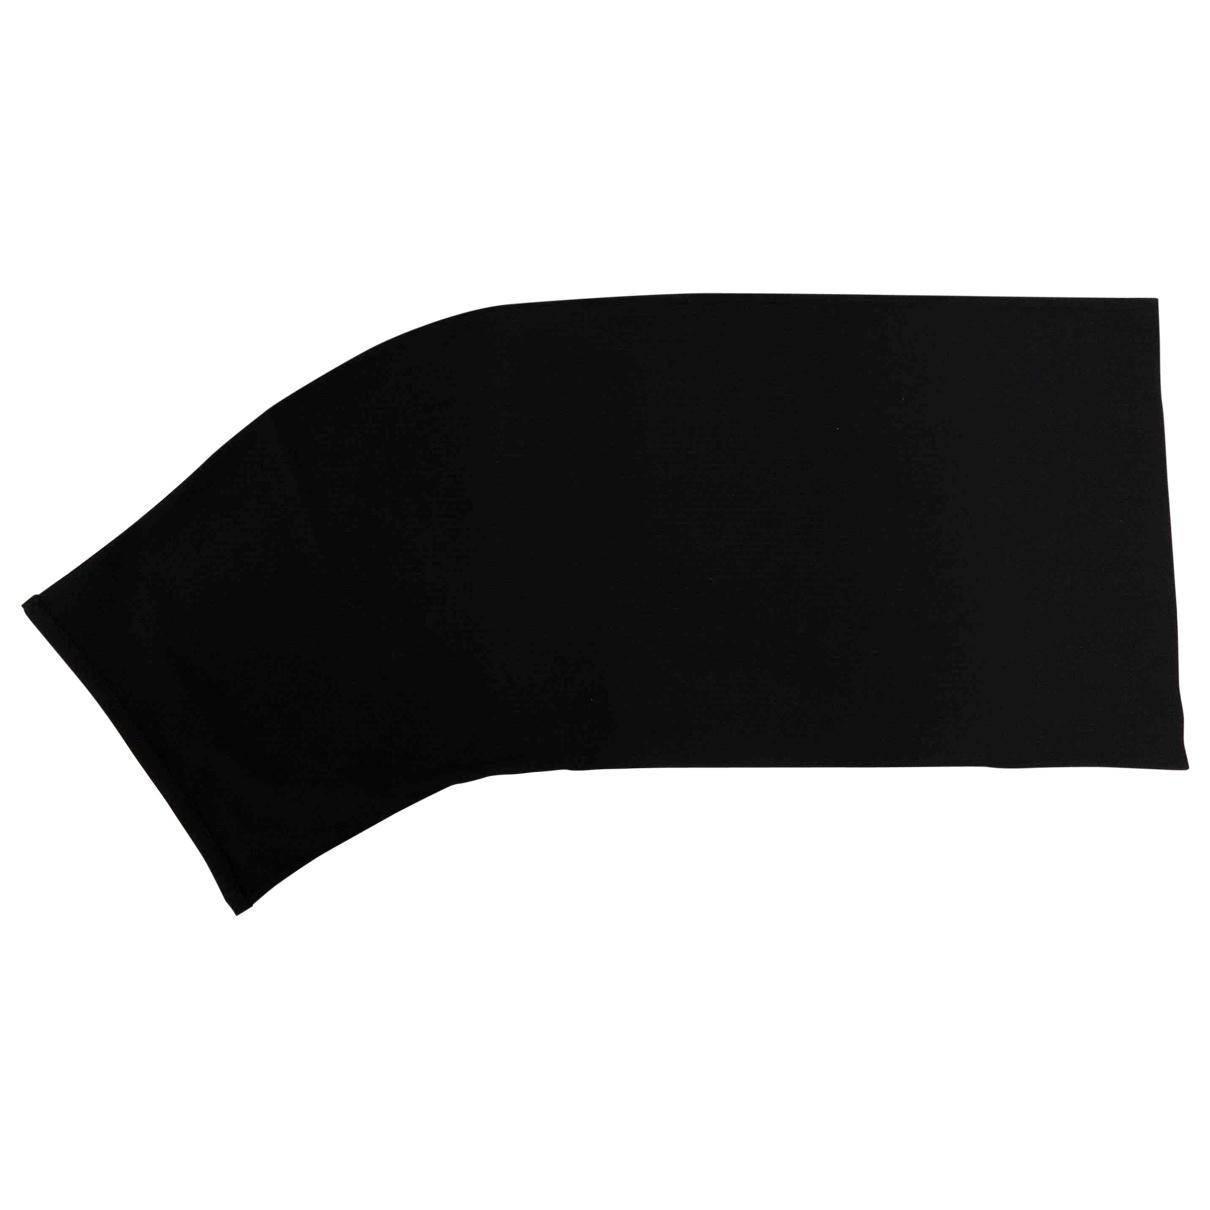 Comme Des Garcons \N Black Wool skirt for Women M International